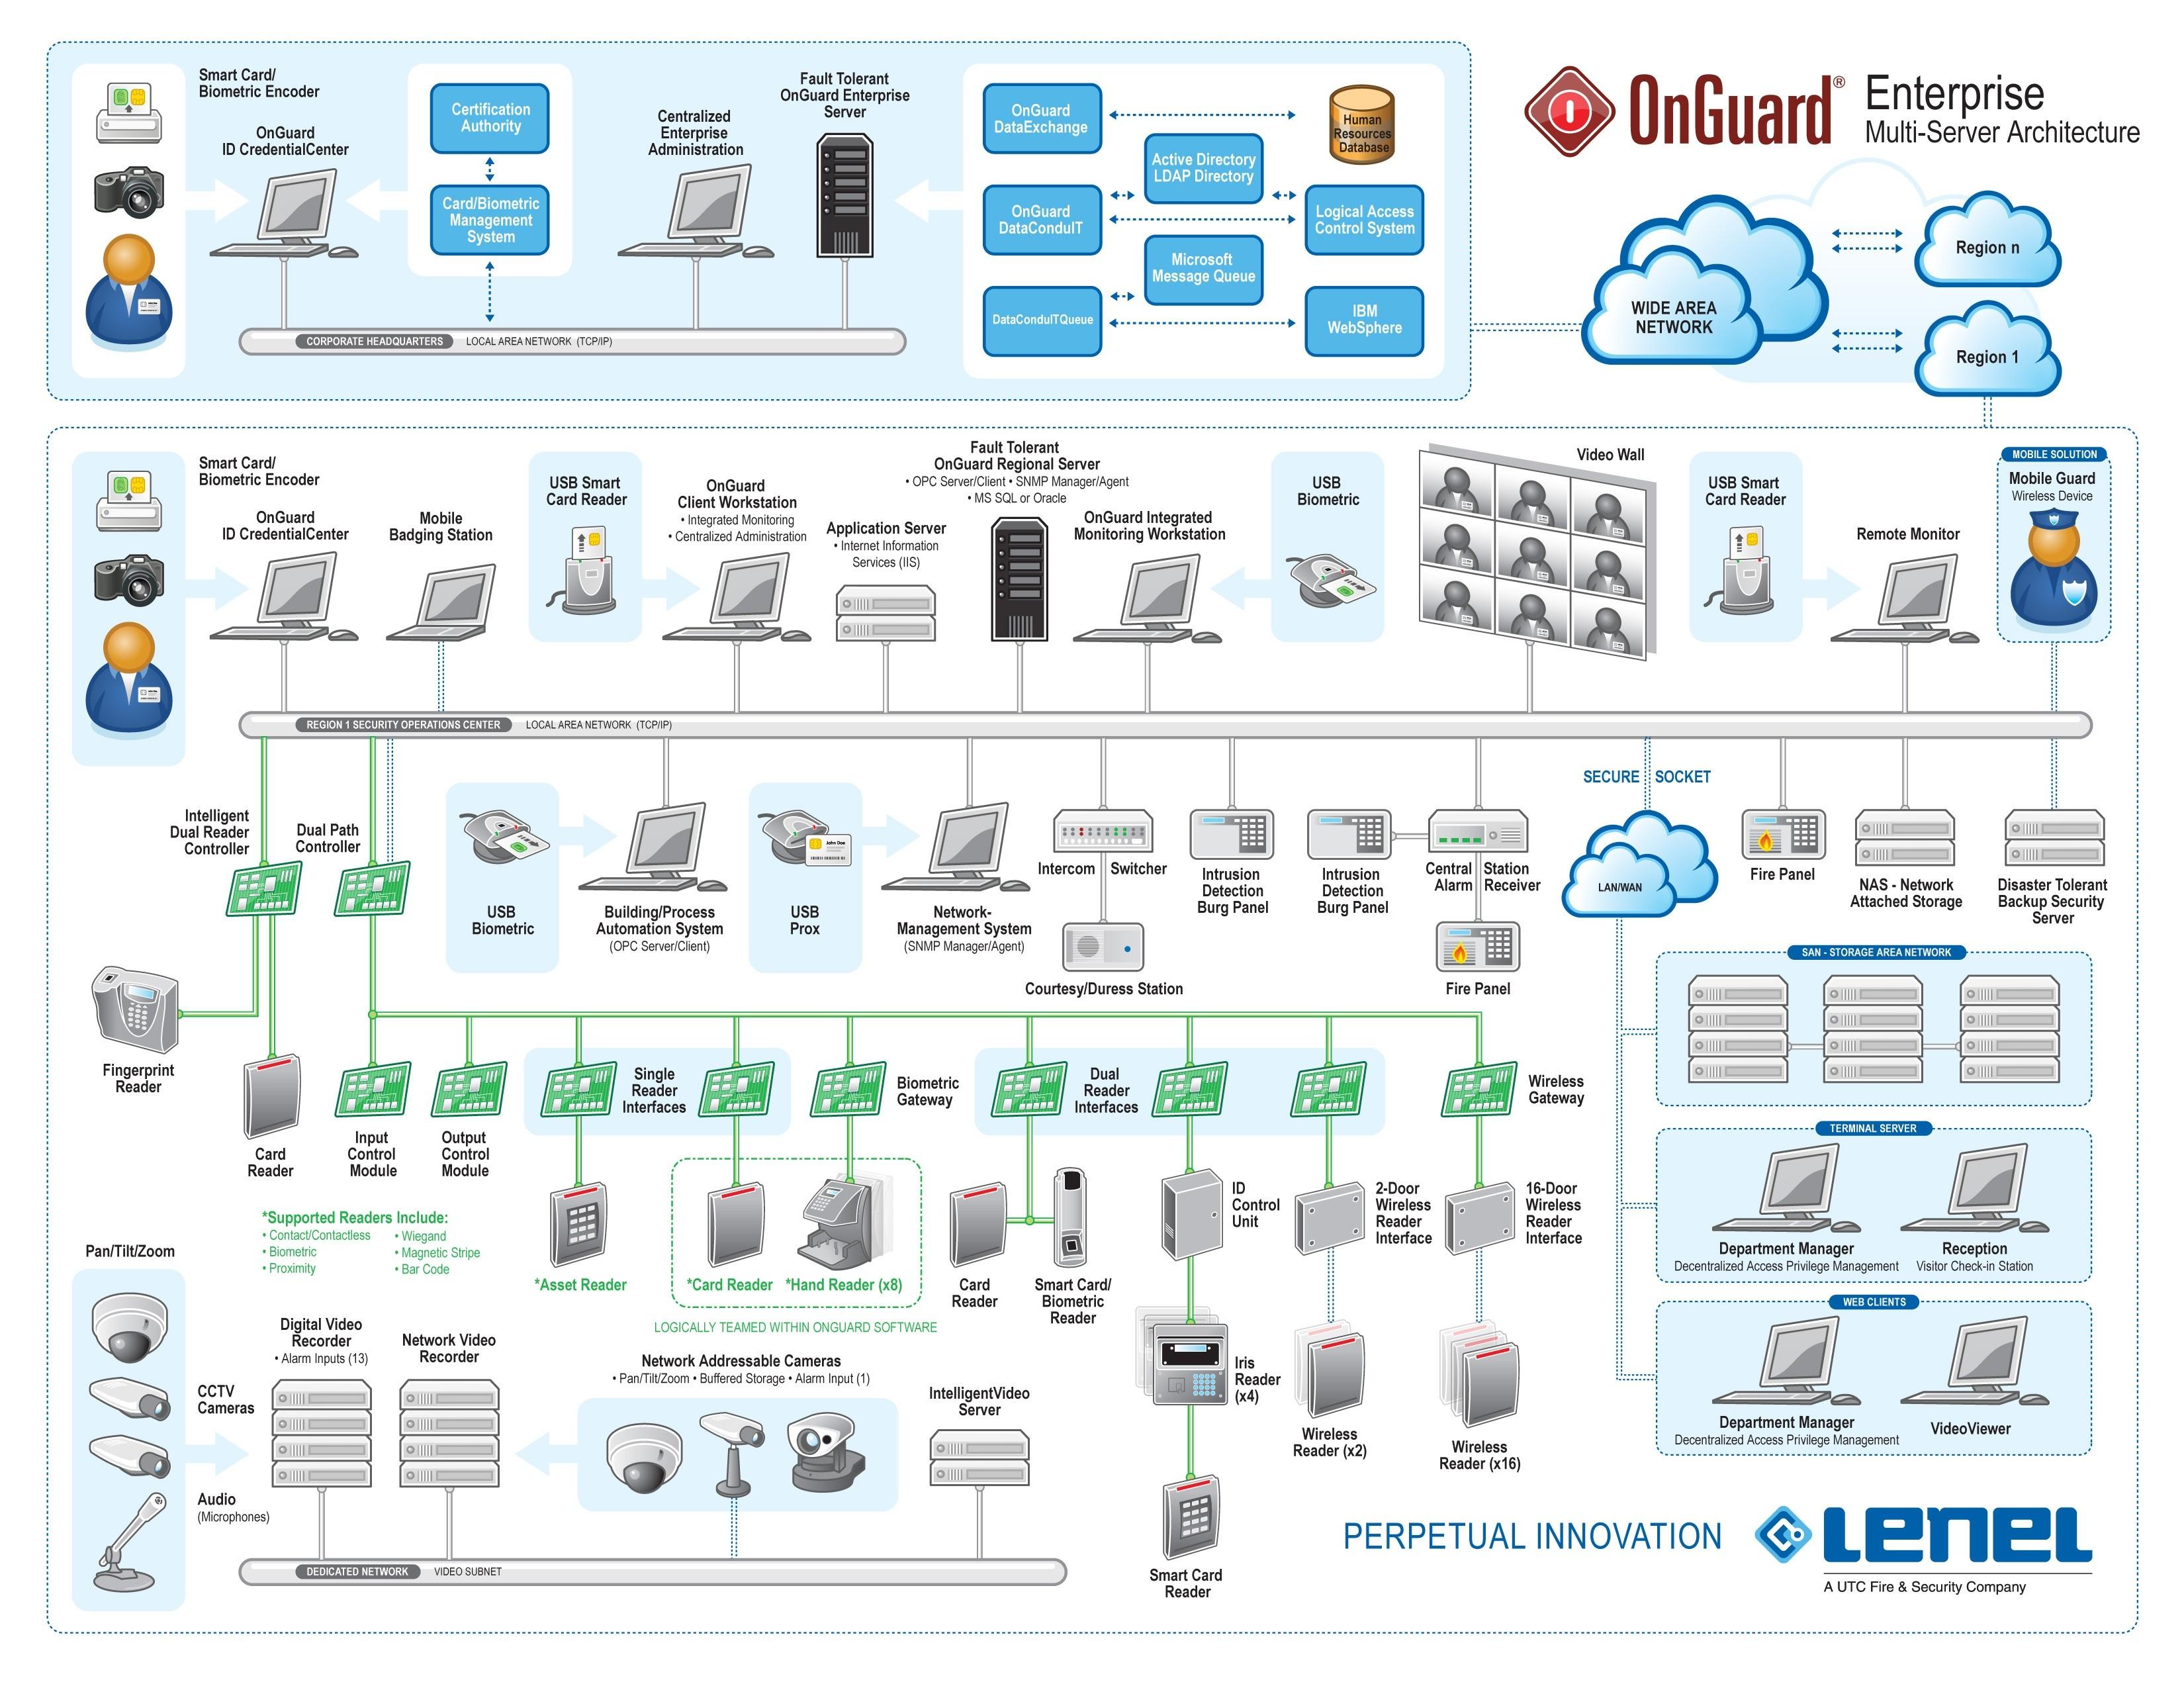 Lenel Access Control Wiring Diagram Lenel Access Control Wiring Diagram Of Lenel Access Control Wiring Diagram